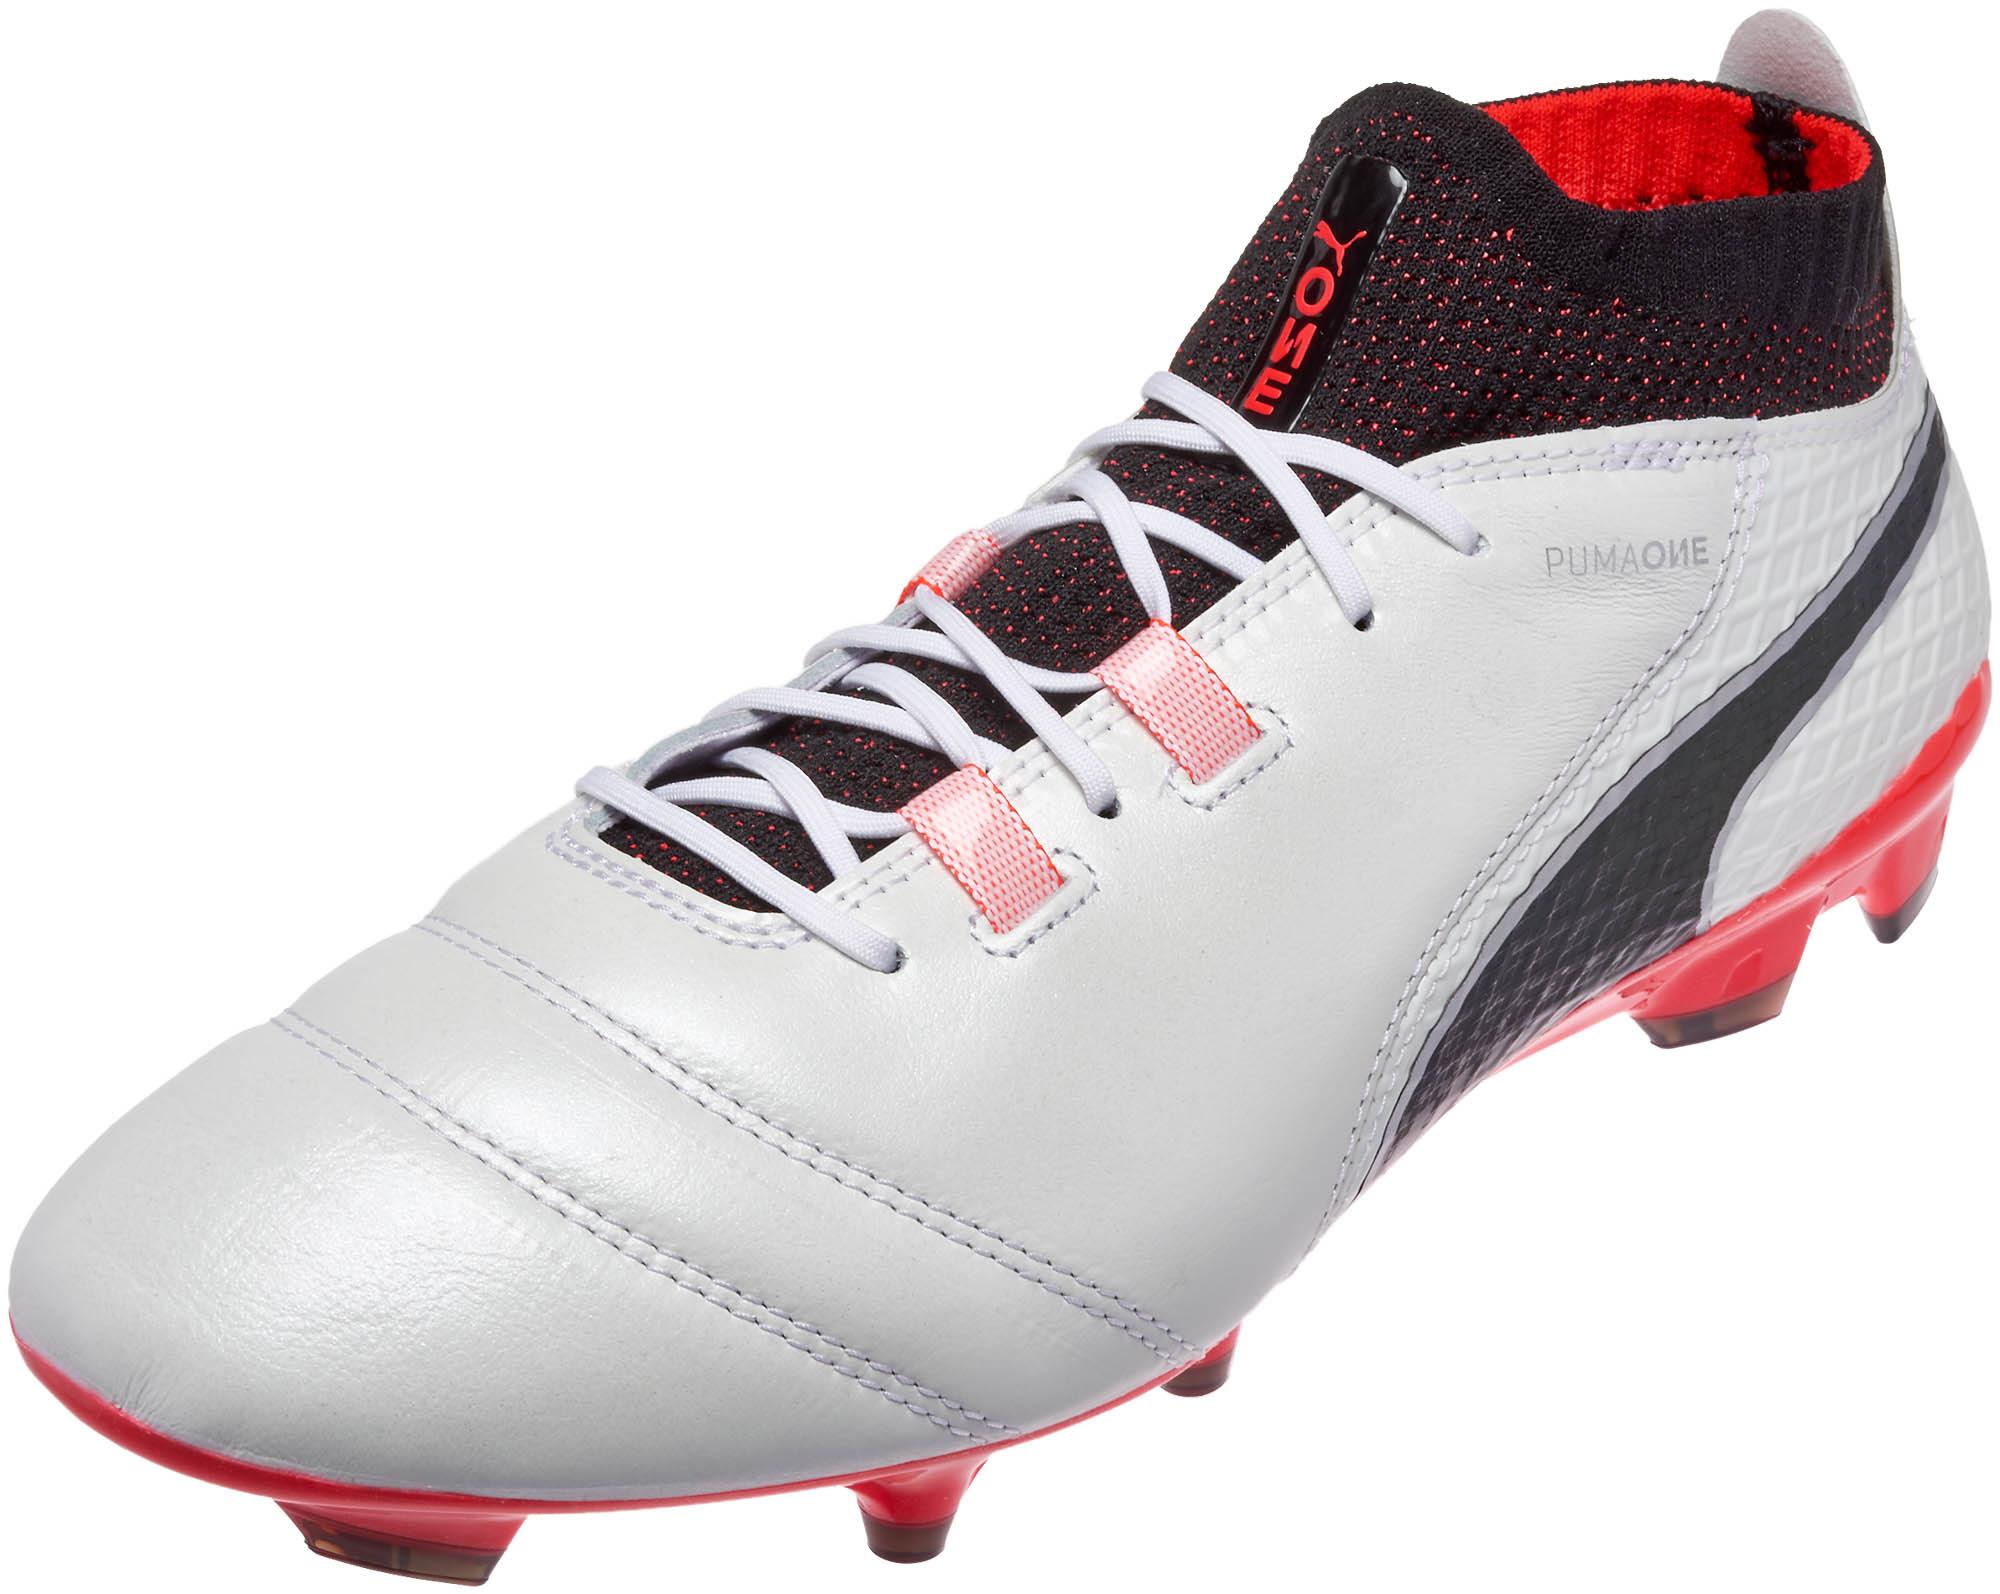 competitive price e2780 4e227 Puma One 17.1 FG Soccer Cleats – White   Fiery Coral